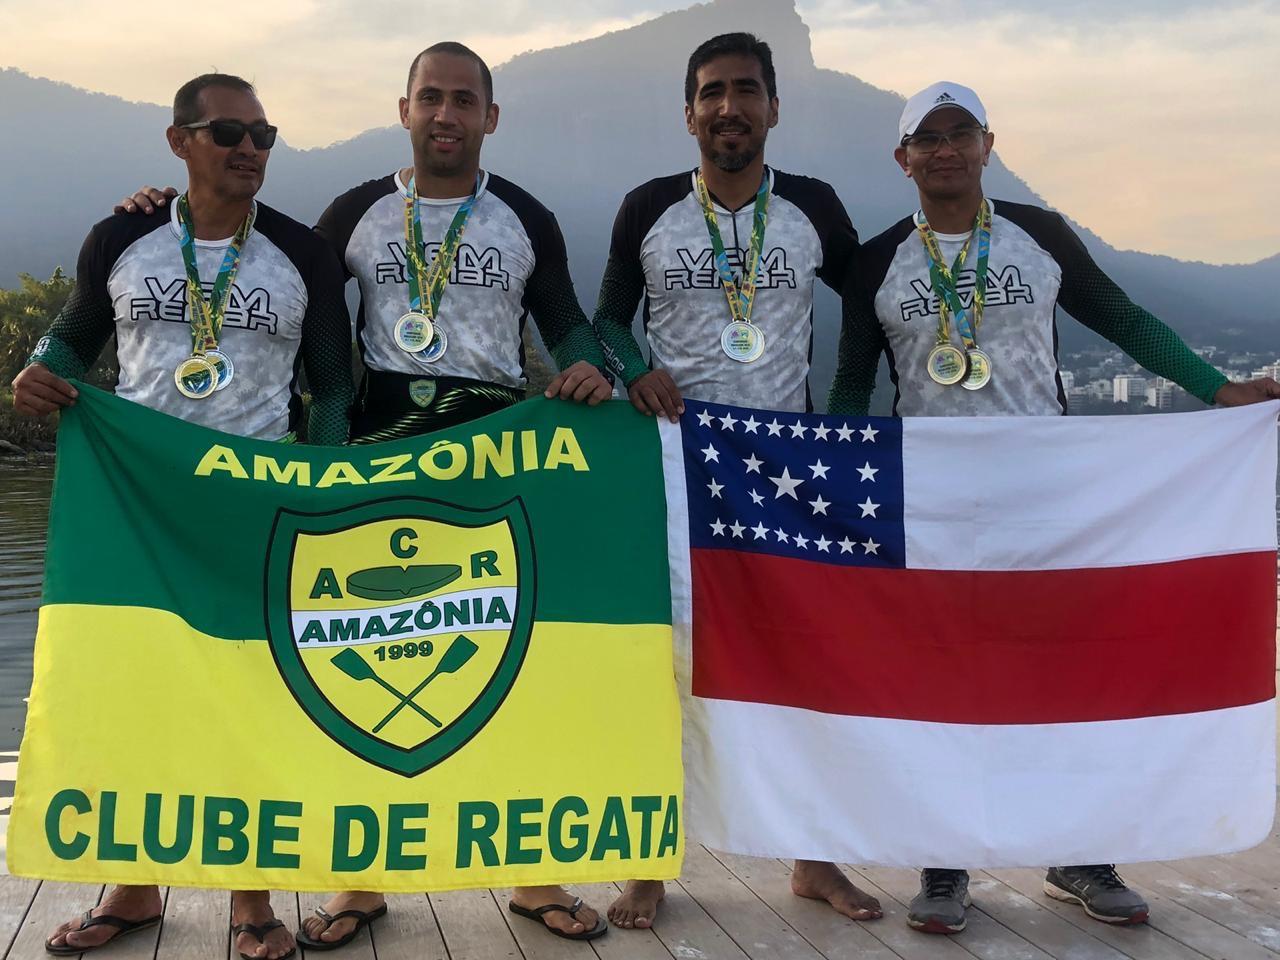 Subtenente do Corpo de Bombeiros conquista medalhas de ouro no Campeonato Brasileiro de Remo Olímpico